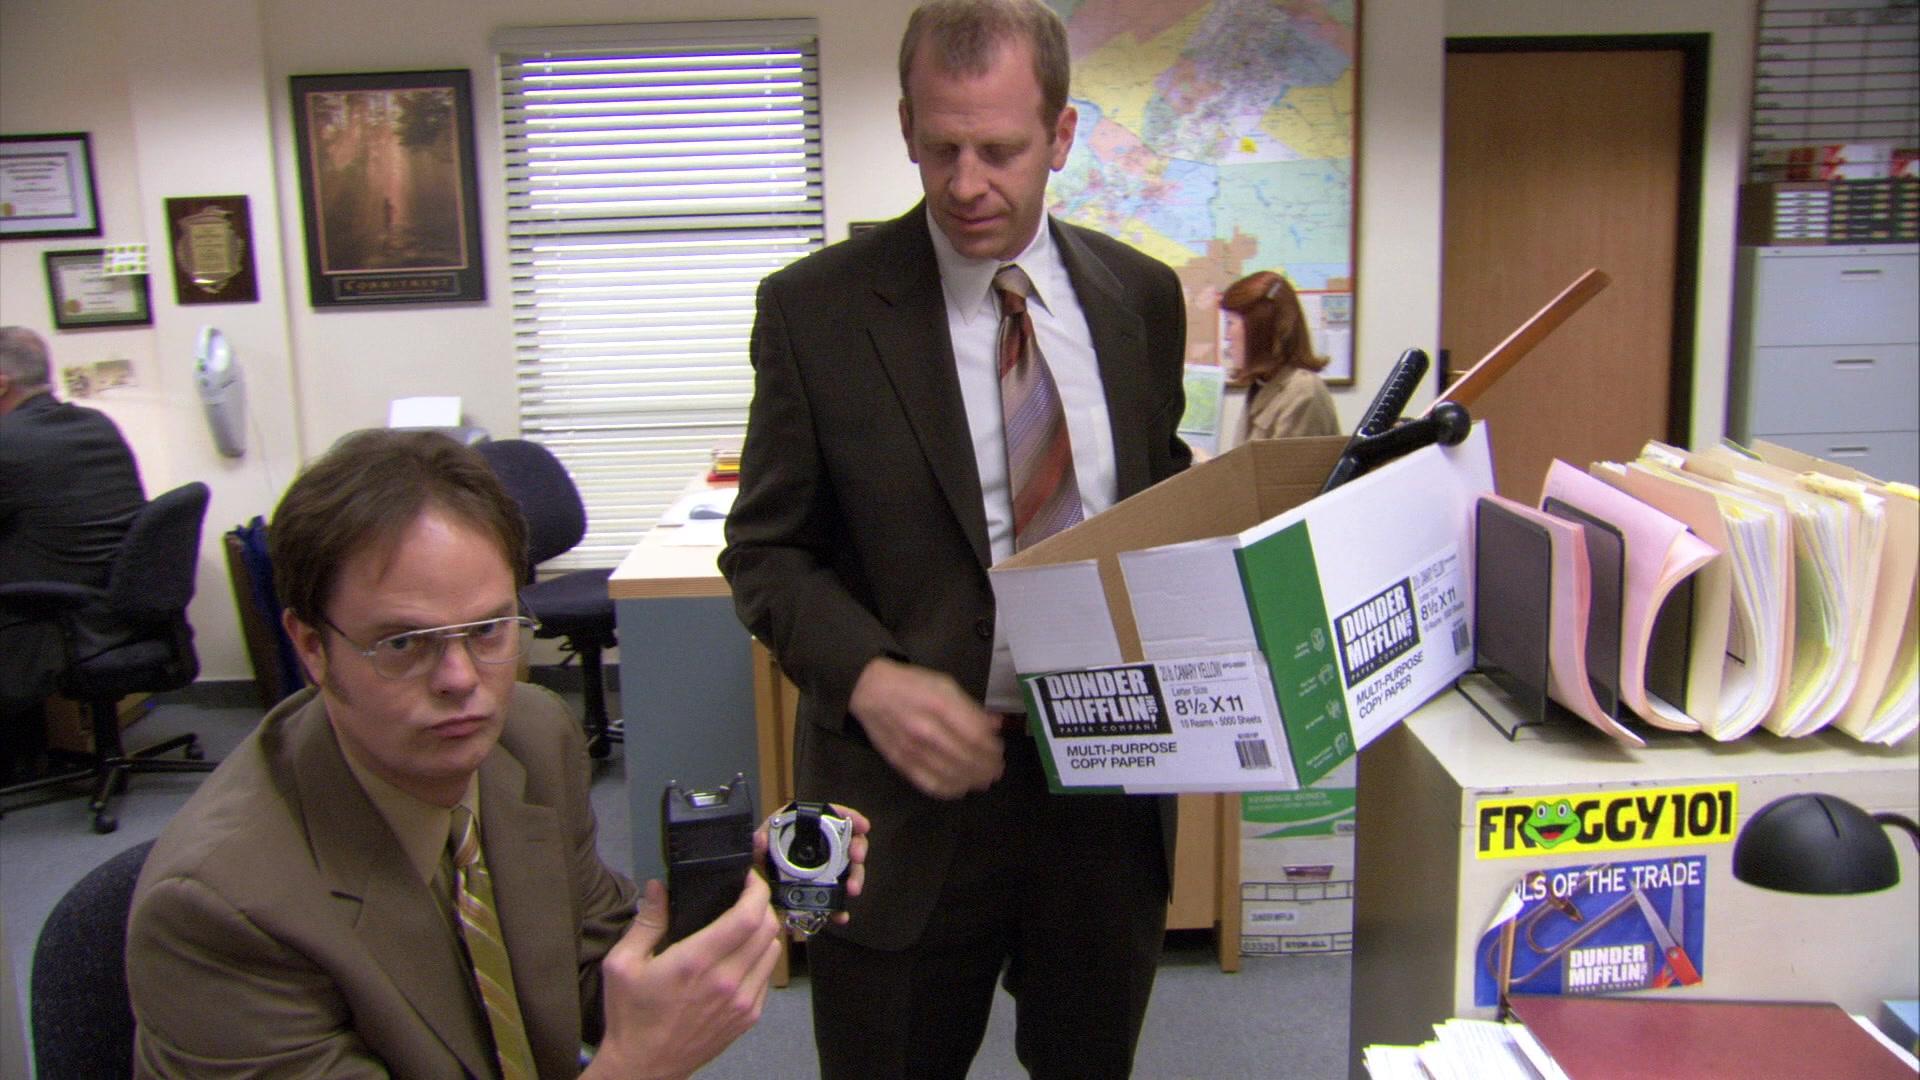 Froggy 101 radio station sticker in the office season 3 episode 19